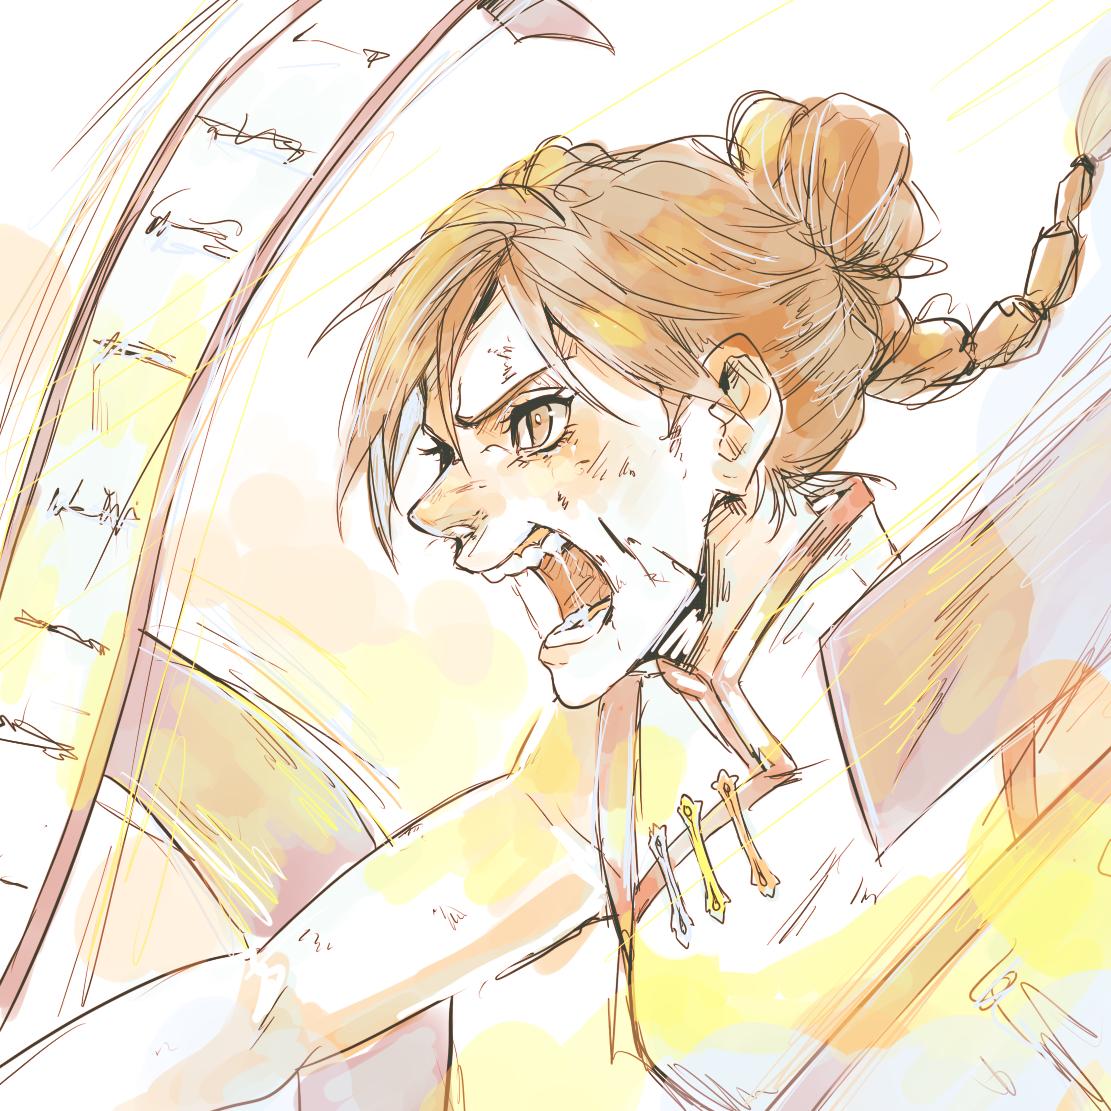 tenten - naruto - zerochan anime image board